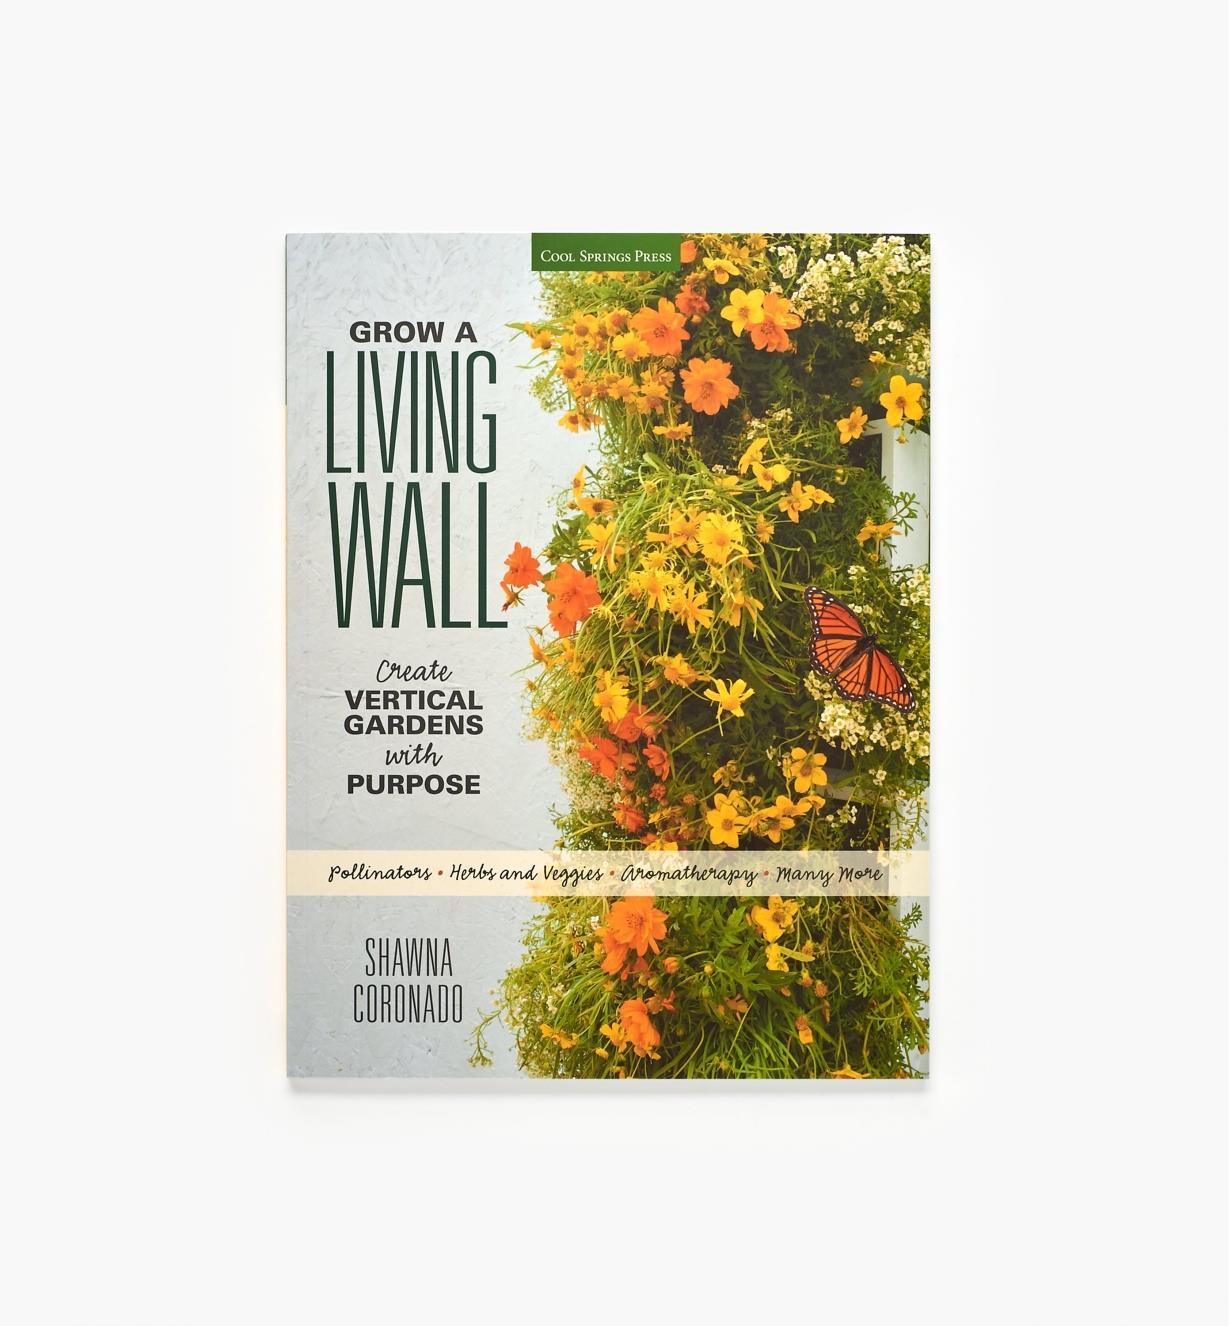 LA772 - Grow a Living Wall